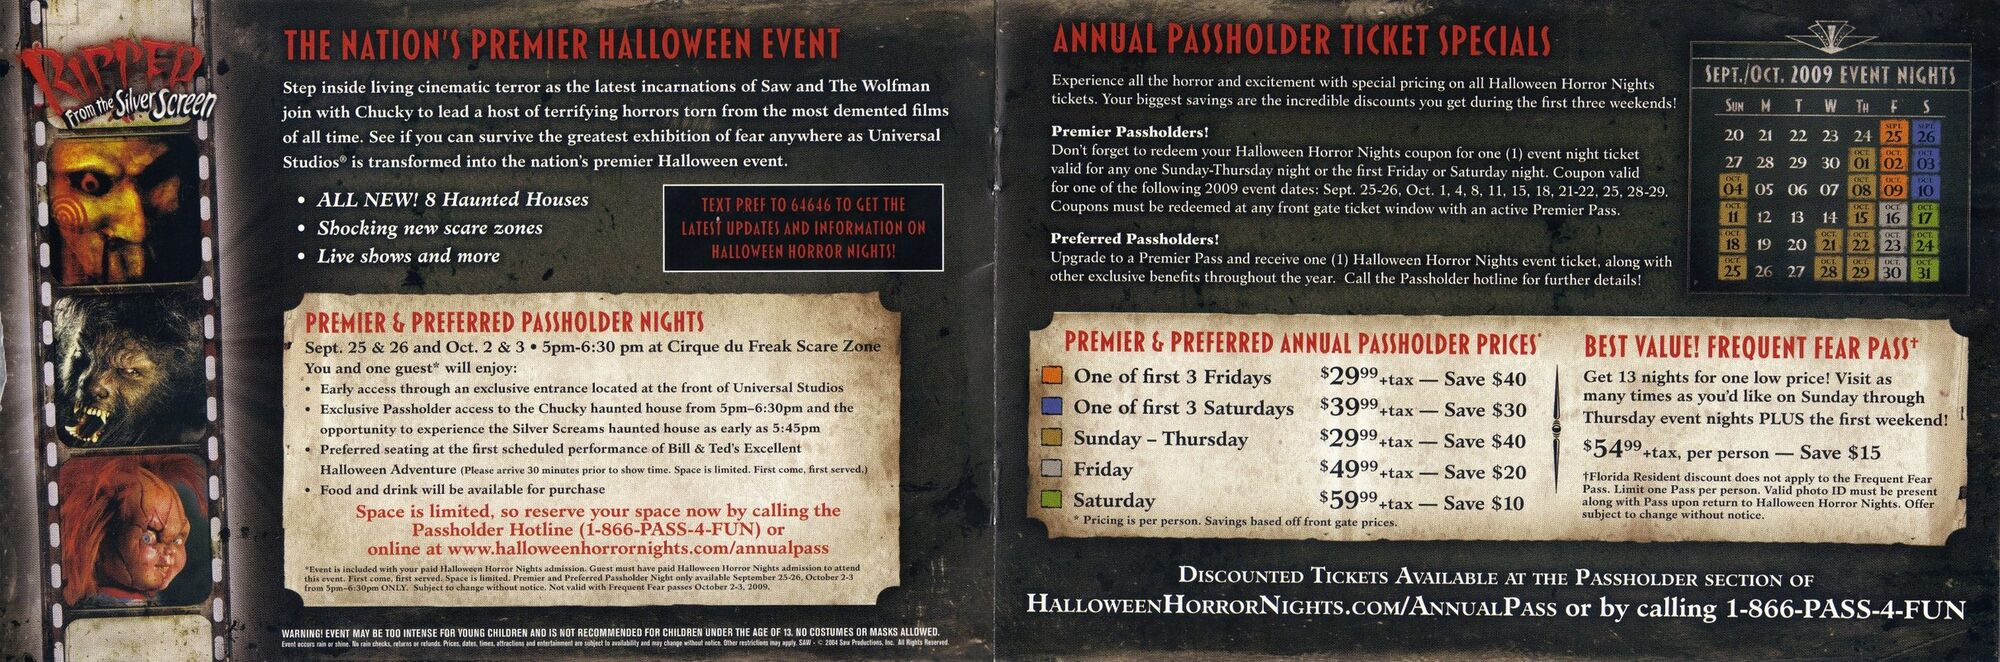 image - halloween horror nights rftss annual passholders